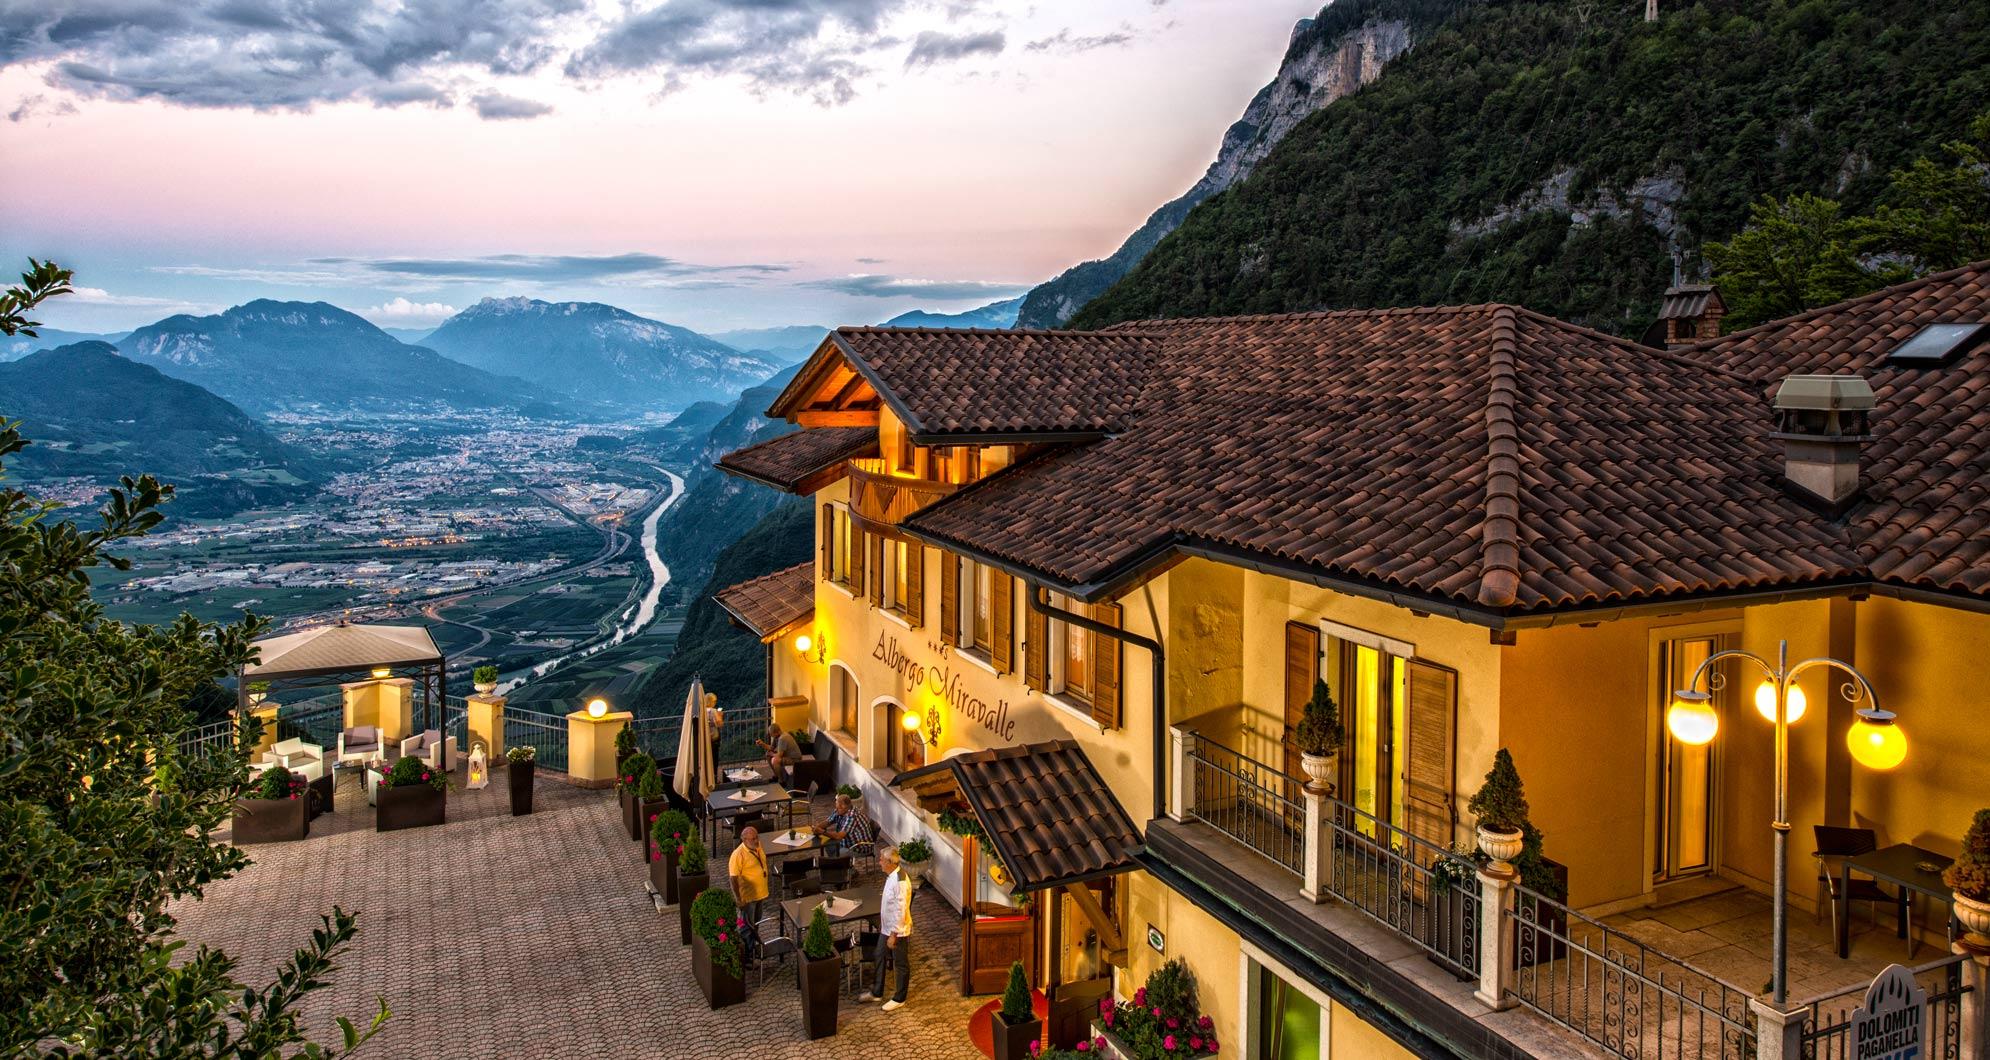 Hotel_miravalle_Albergo09